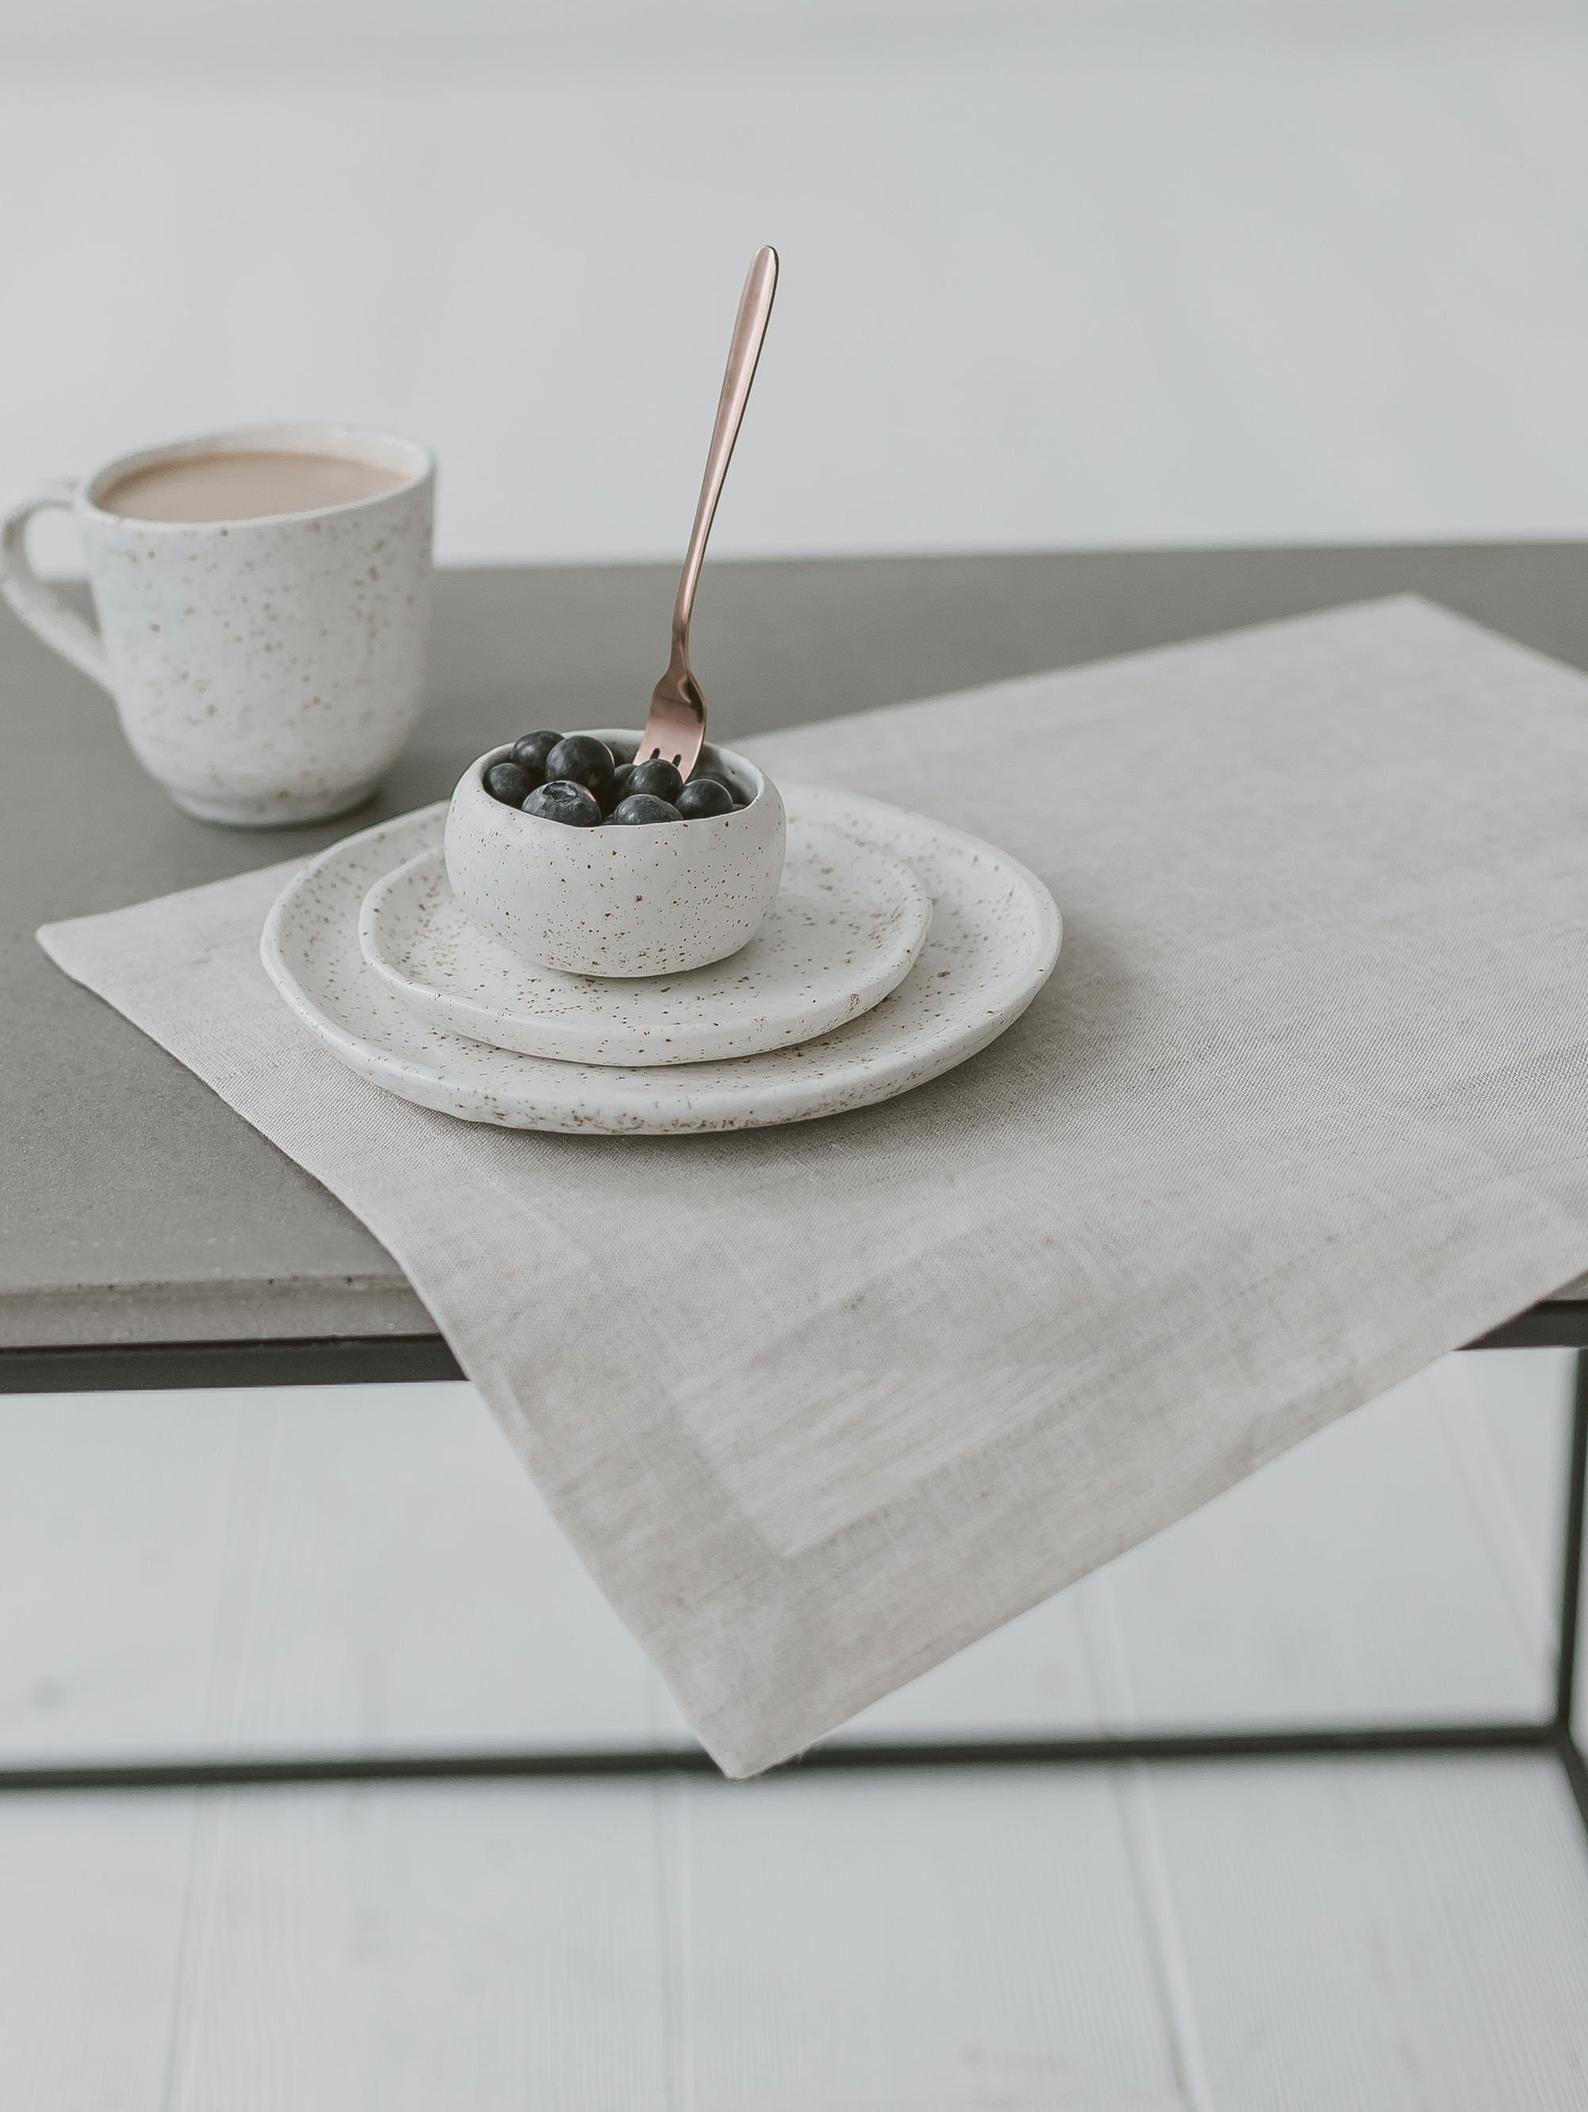 Light Grey Linen Placemats For Elegant Wedding Grey Place Etsy In 2021 Linen Placemats Rustic Placemats Cloth Dinner Napkins